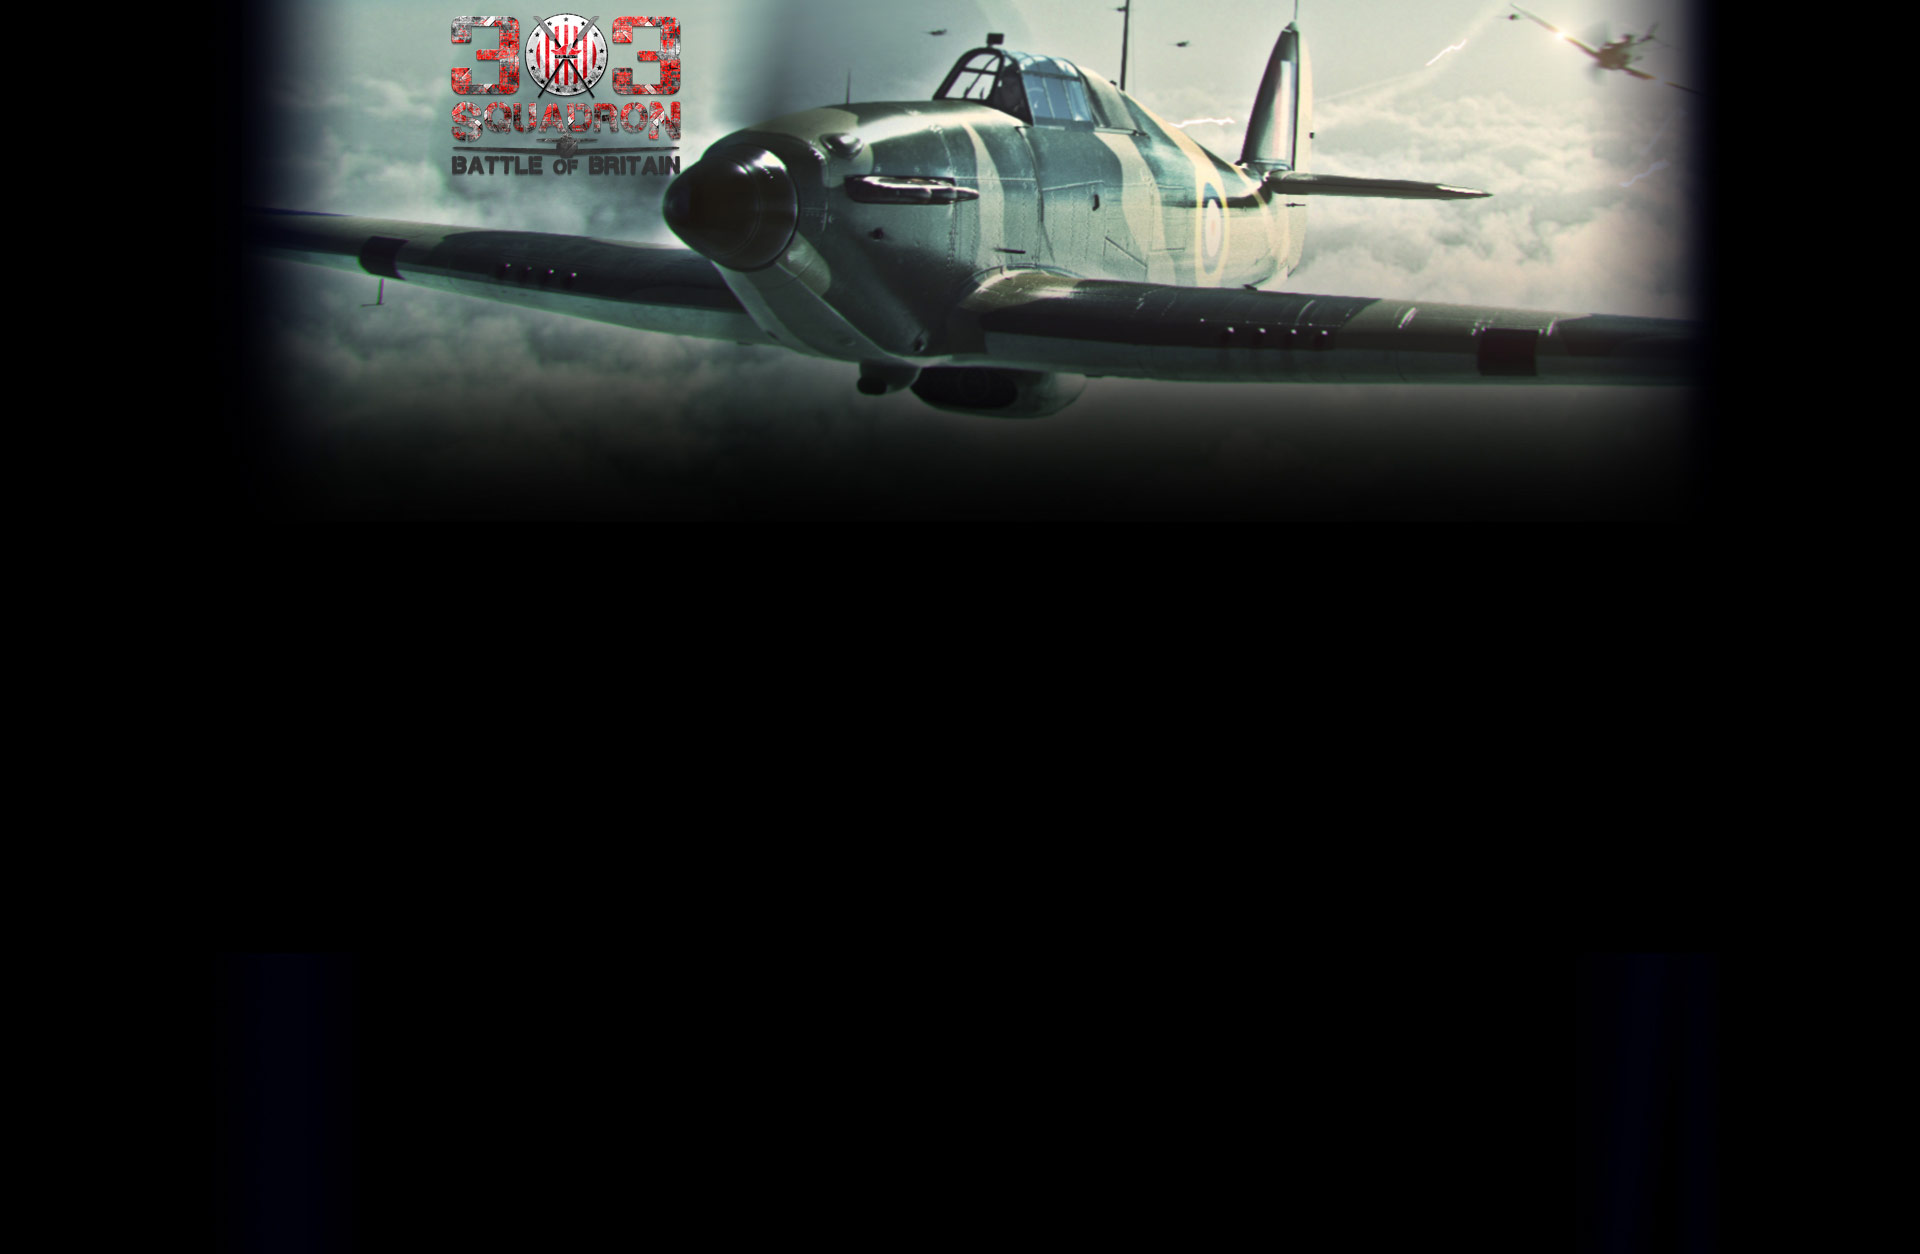 303 Squadron: Battle of Britain   GAMESLOAD